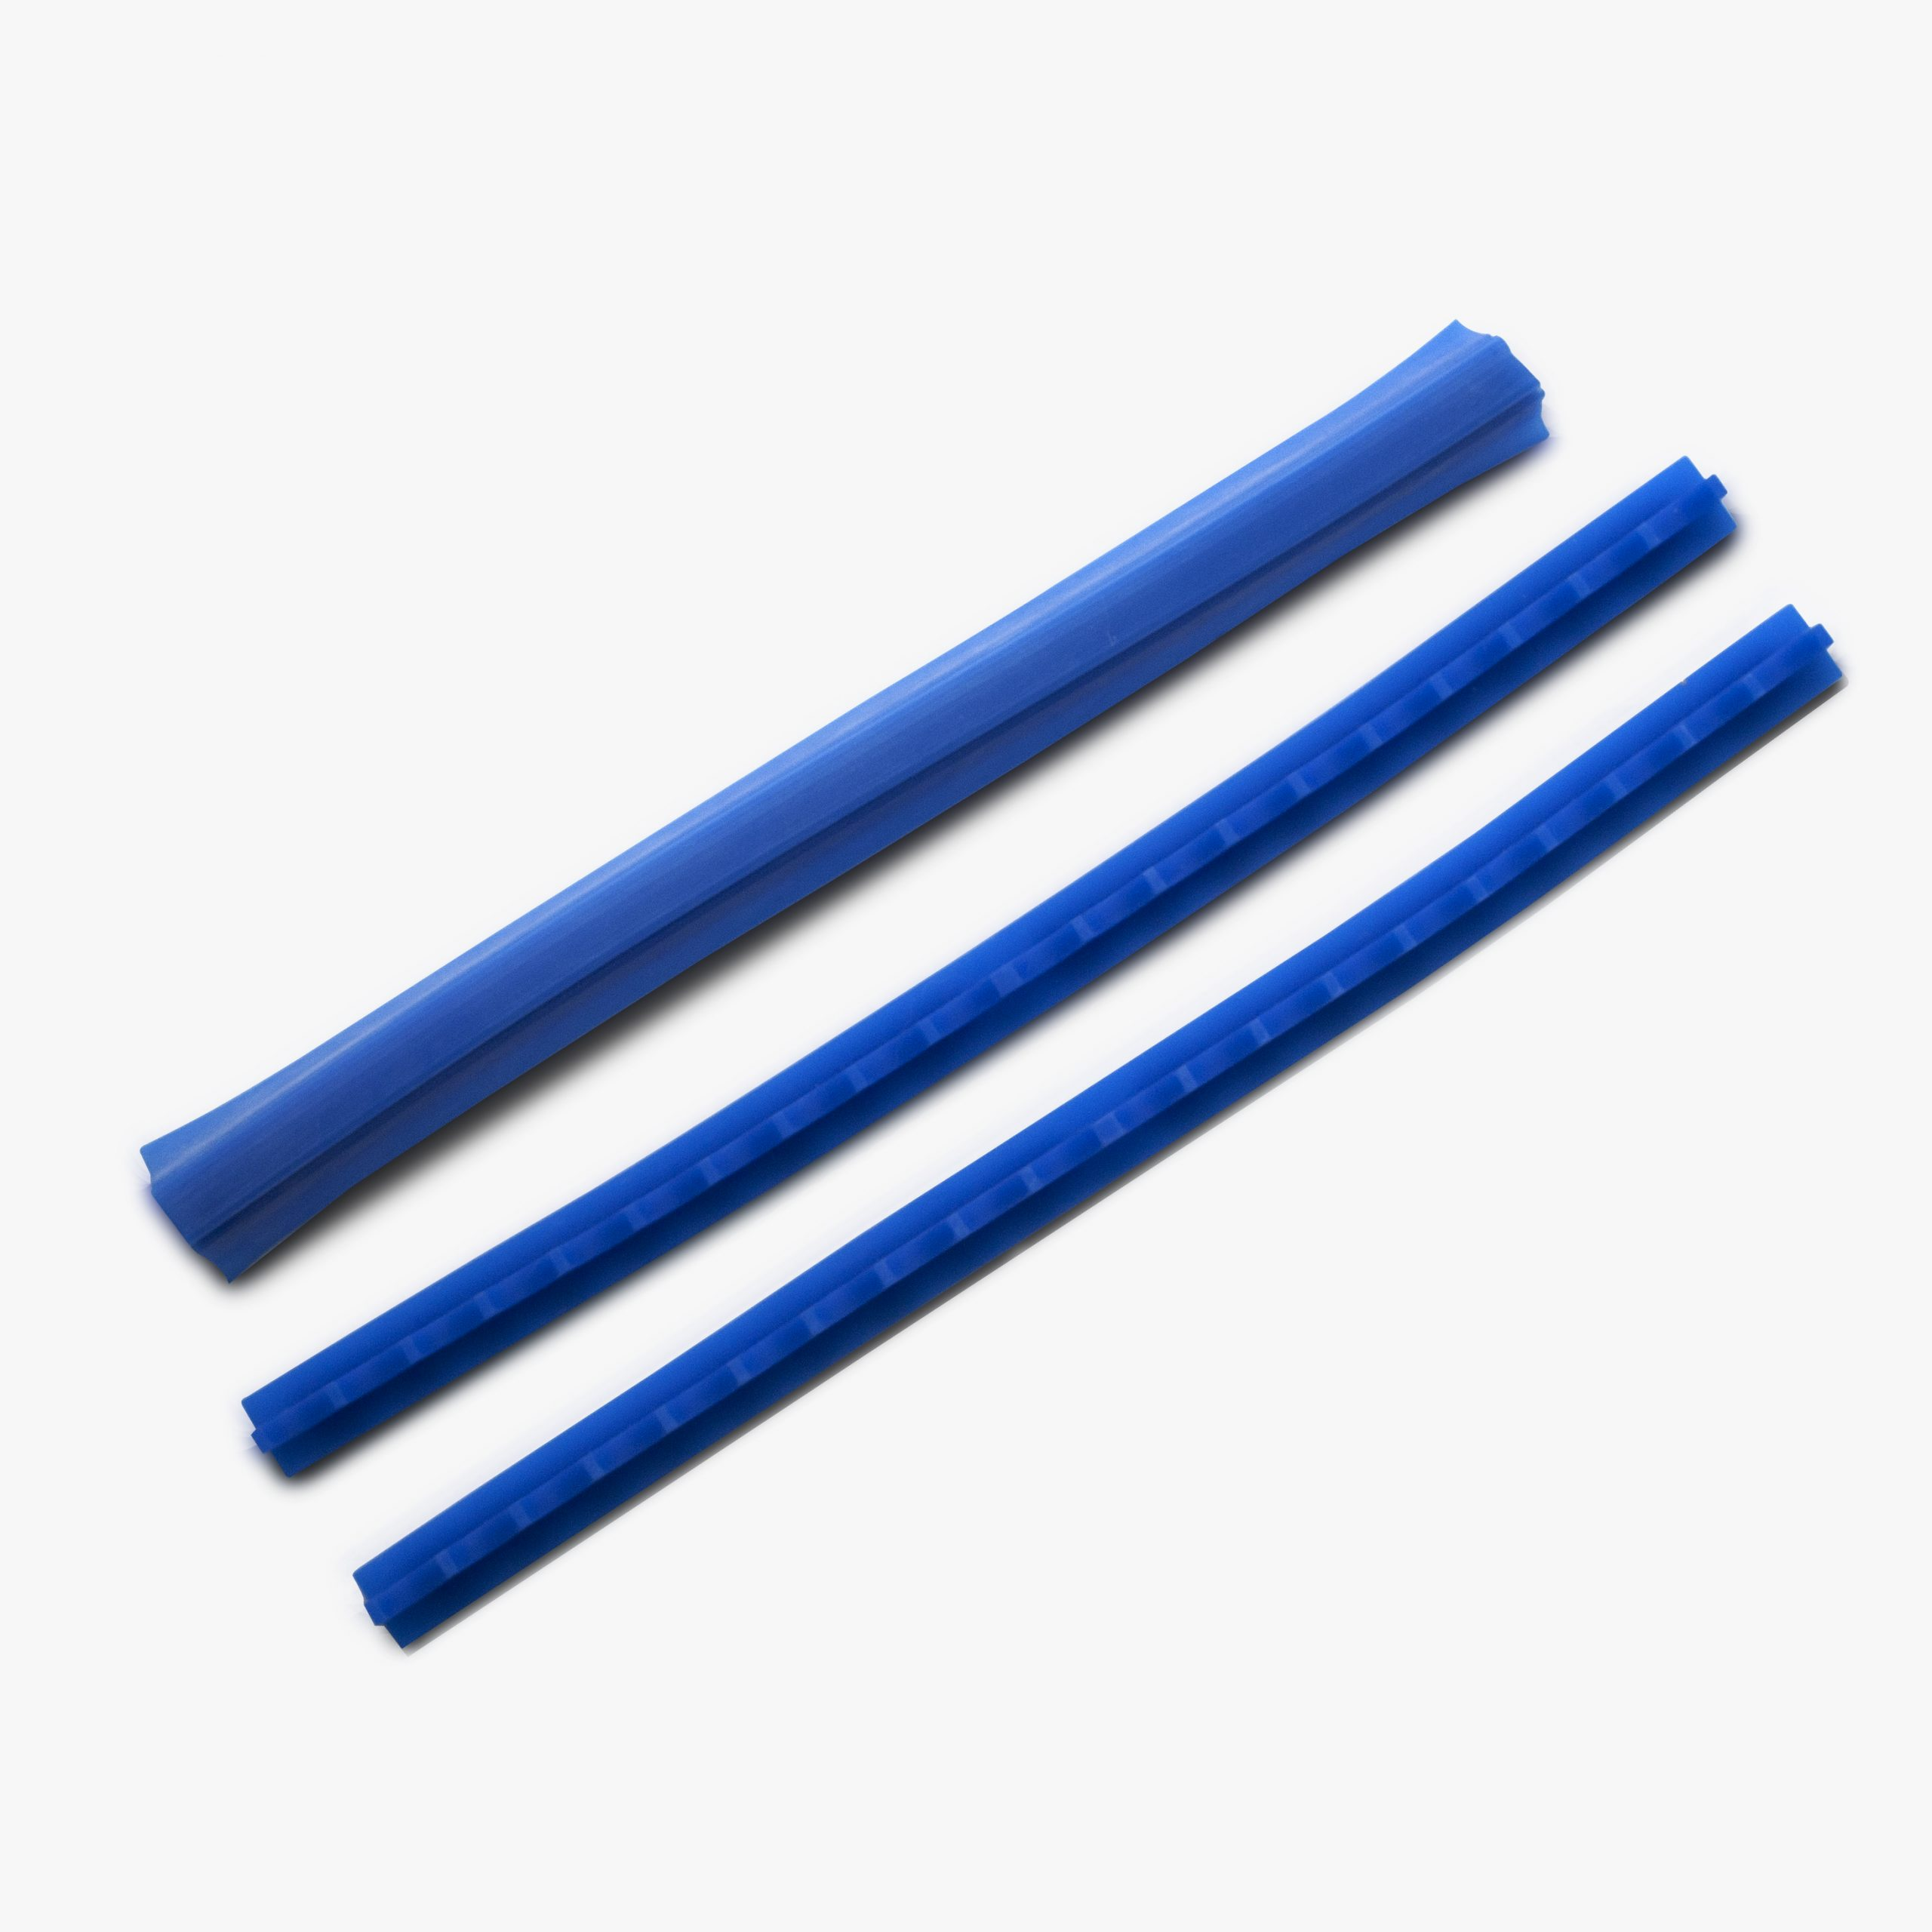 Silicone strip 1-1_29995_1_1200 x 1200